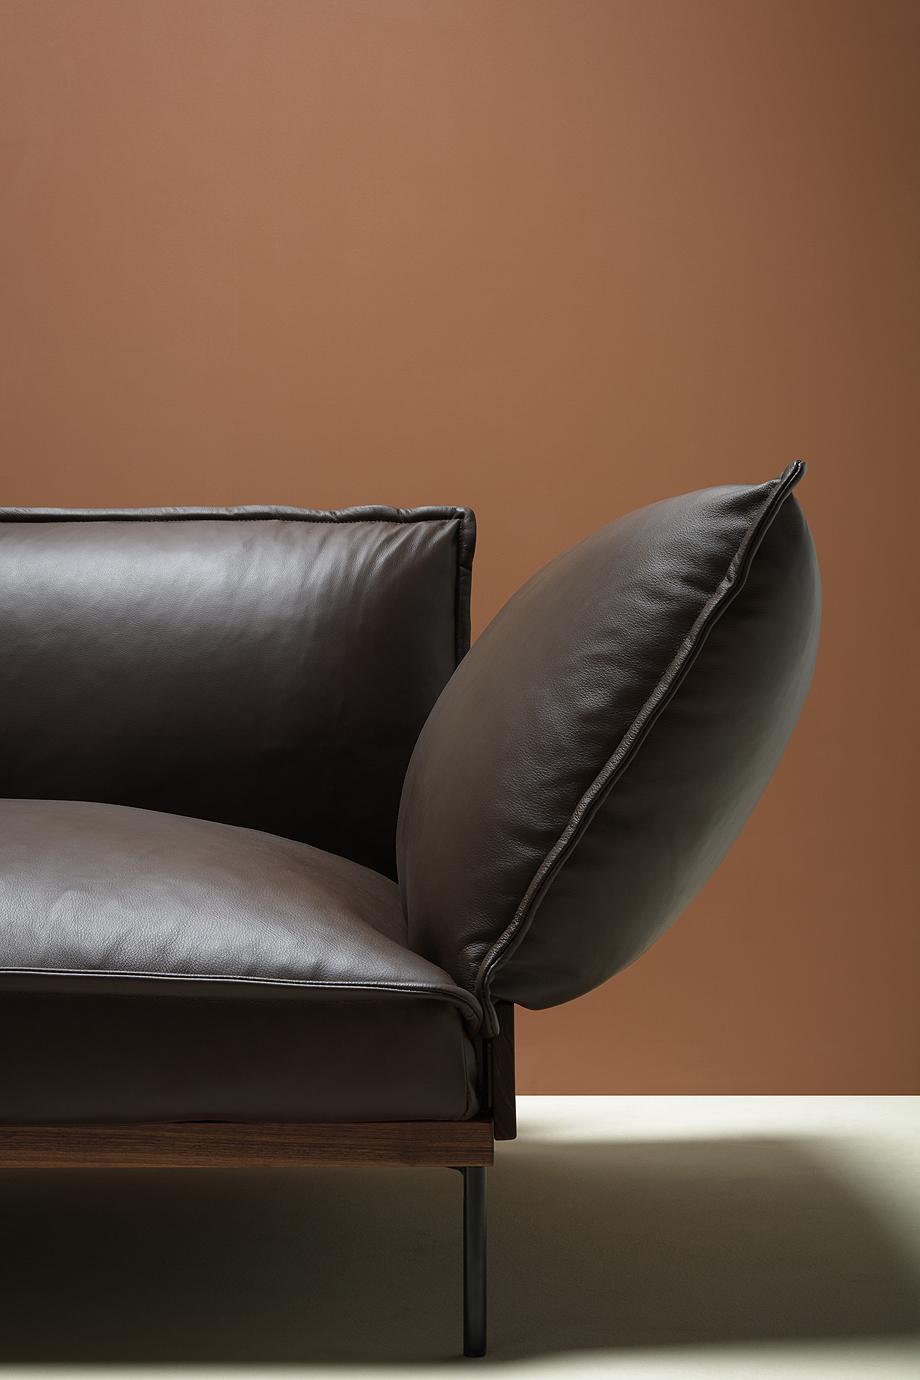 sofa jord de luca nichetto para fogia (4)